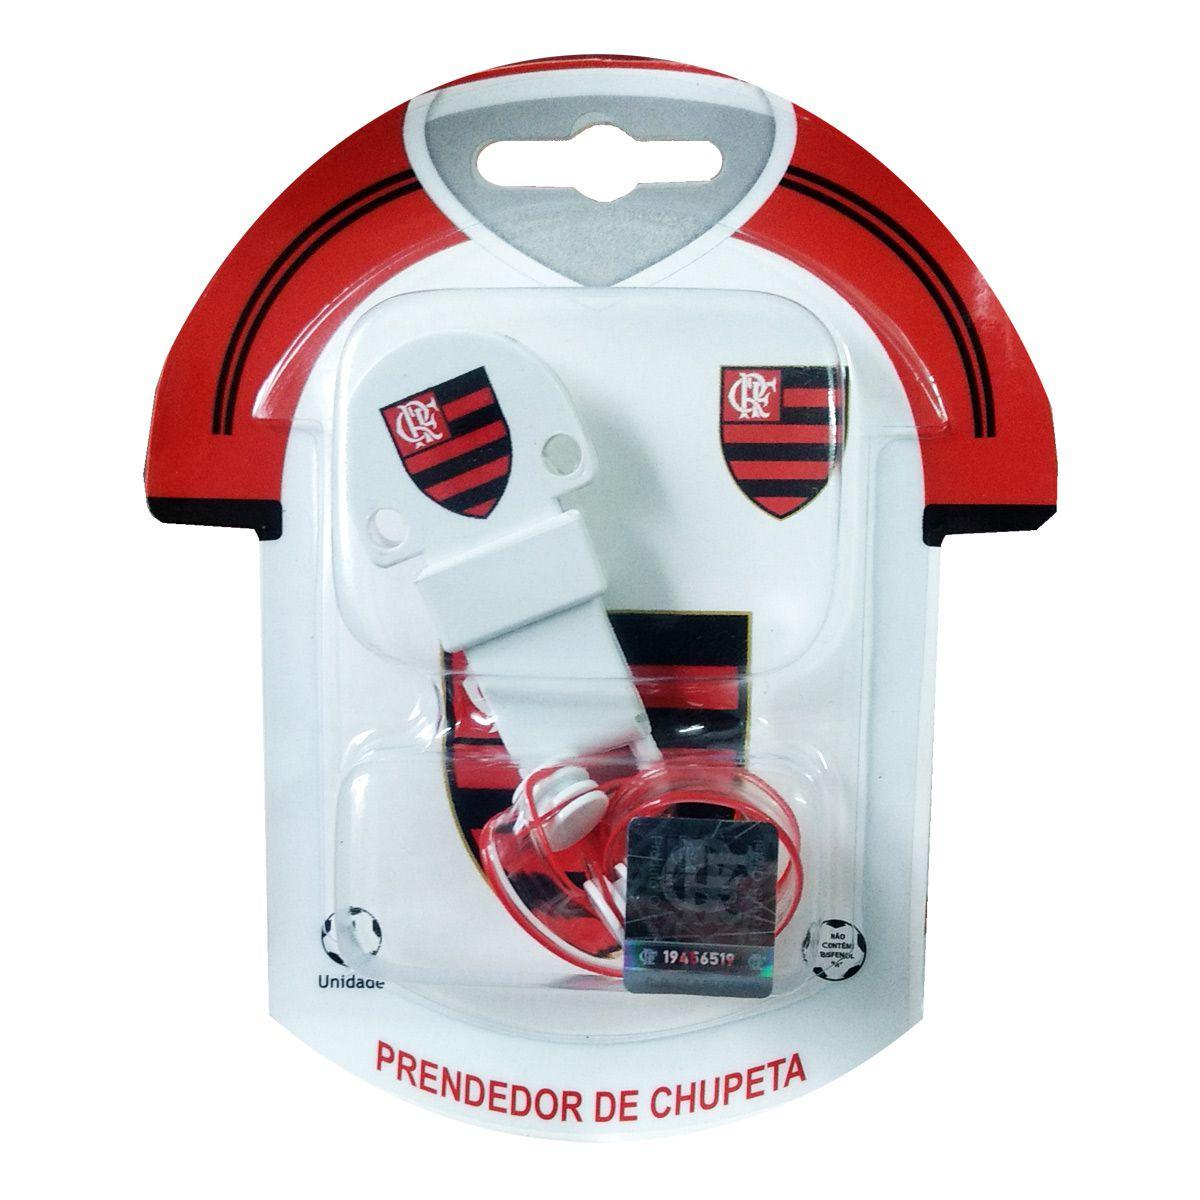 Prendedor de Chupeta do Flamengo